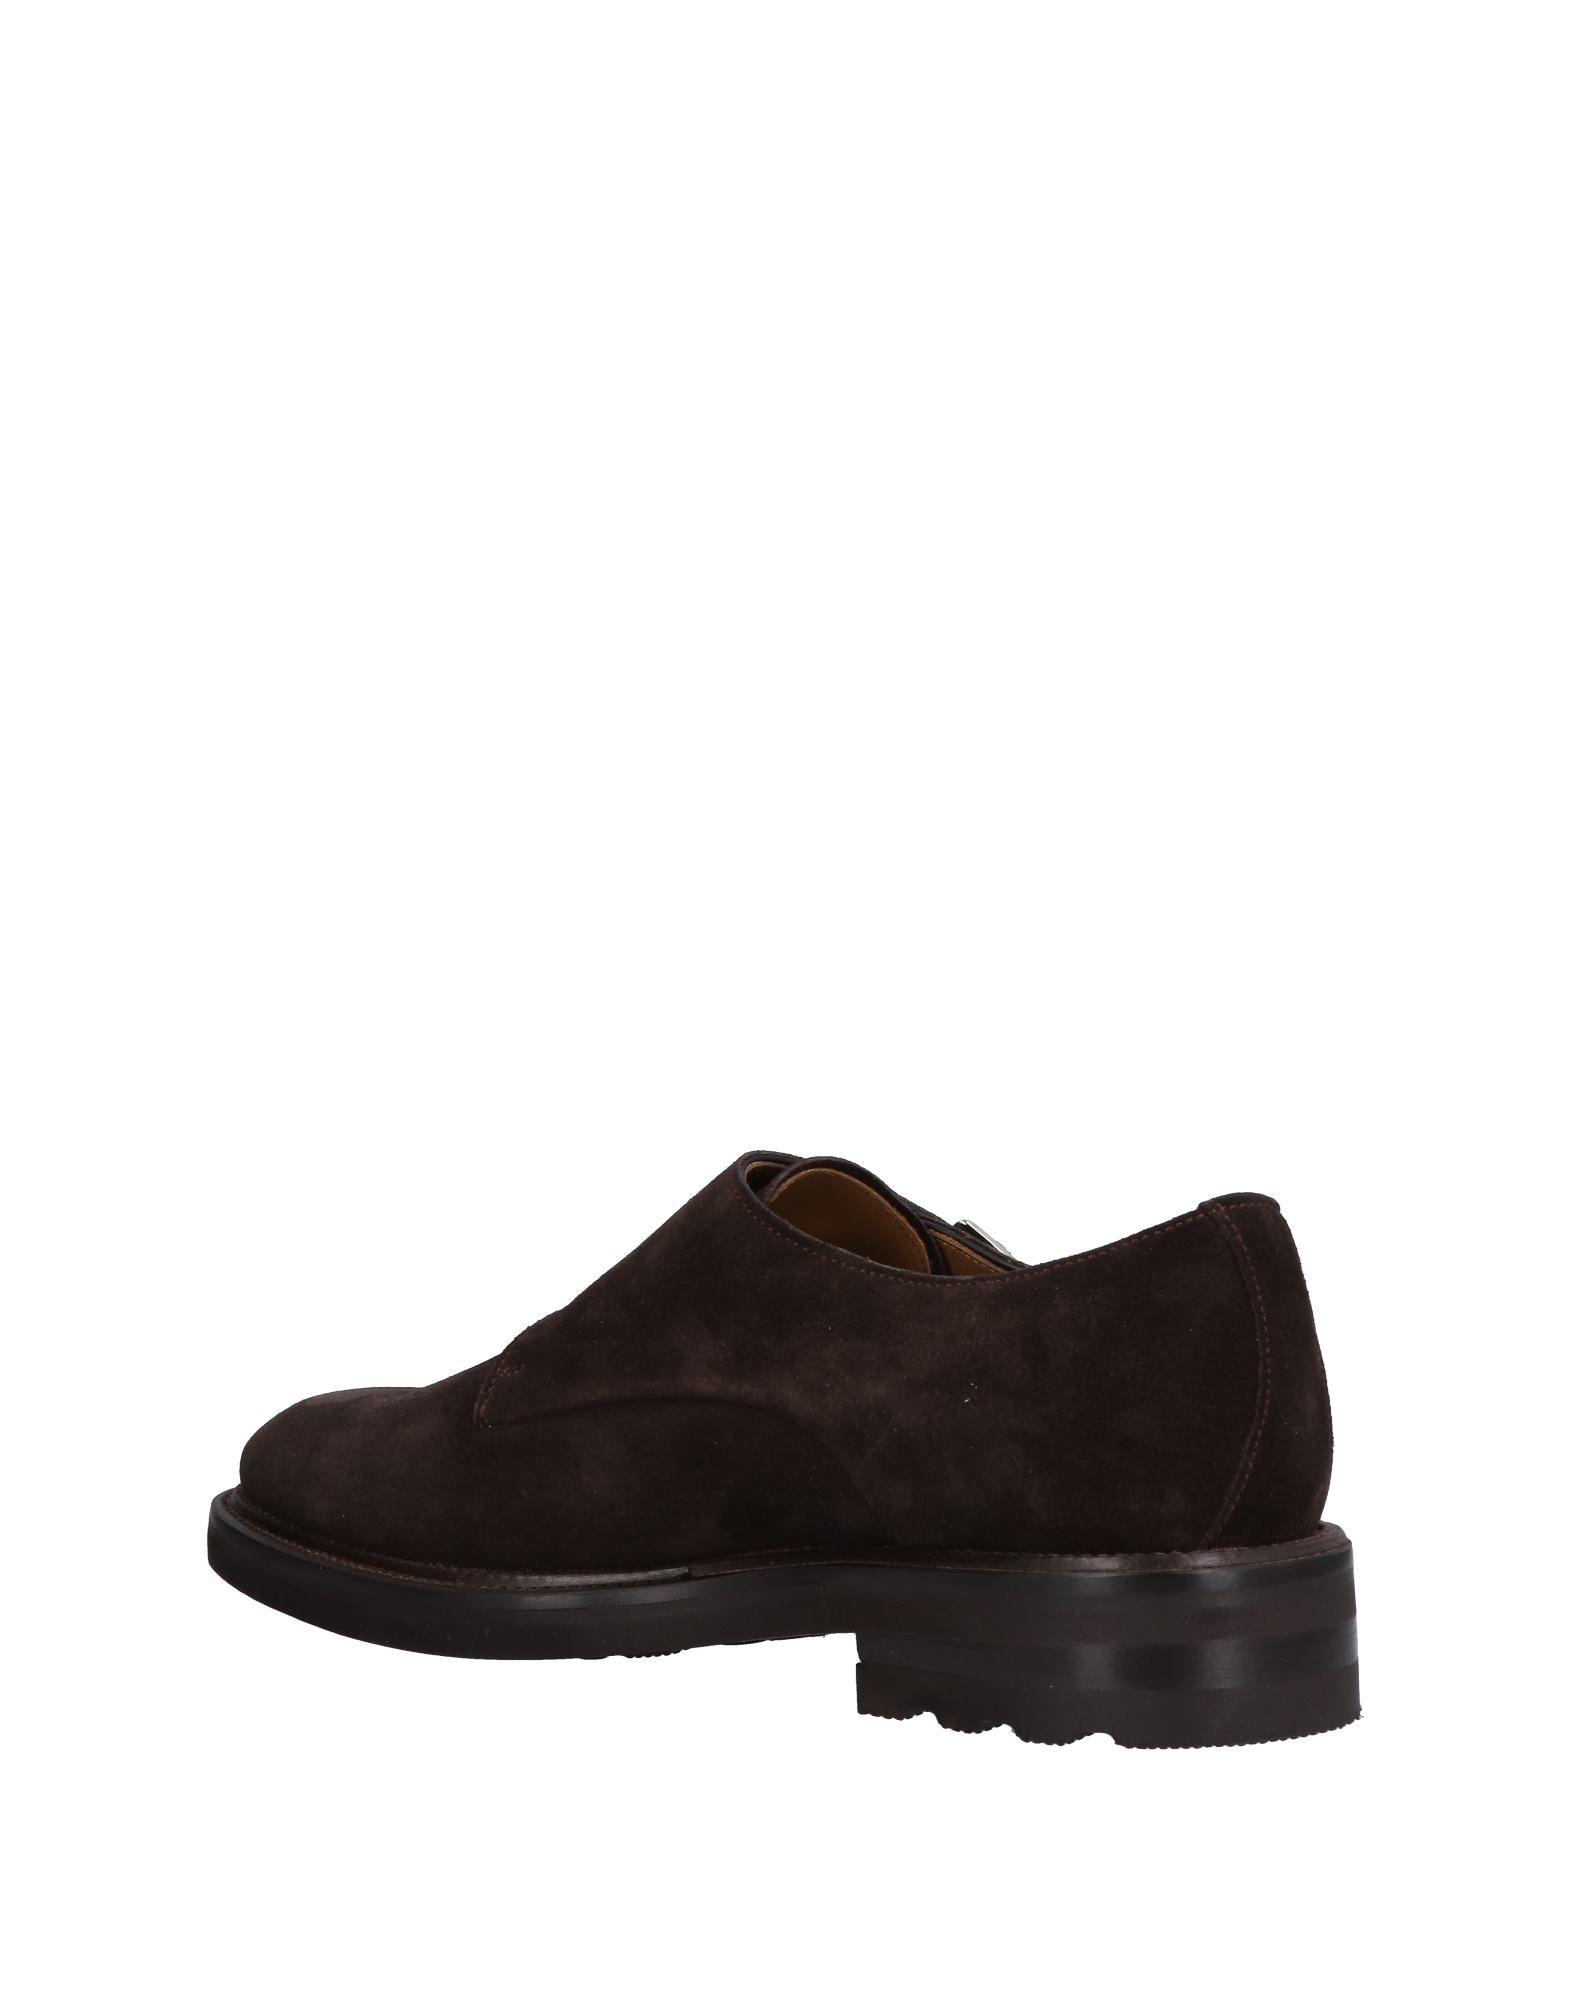 Rabatt Herren echte Schuhe Calpierre Mokassins Herren Rabatt  11460450FR 487928